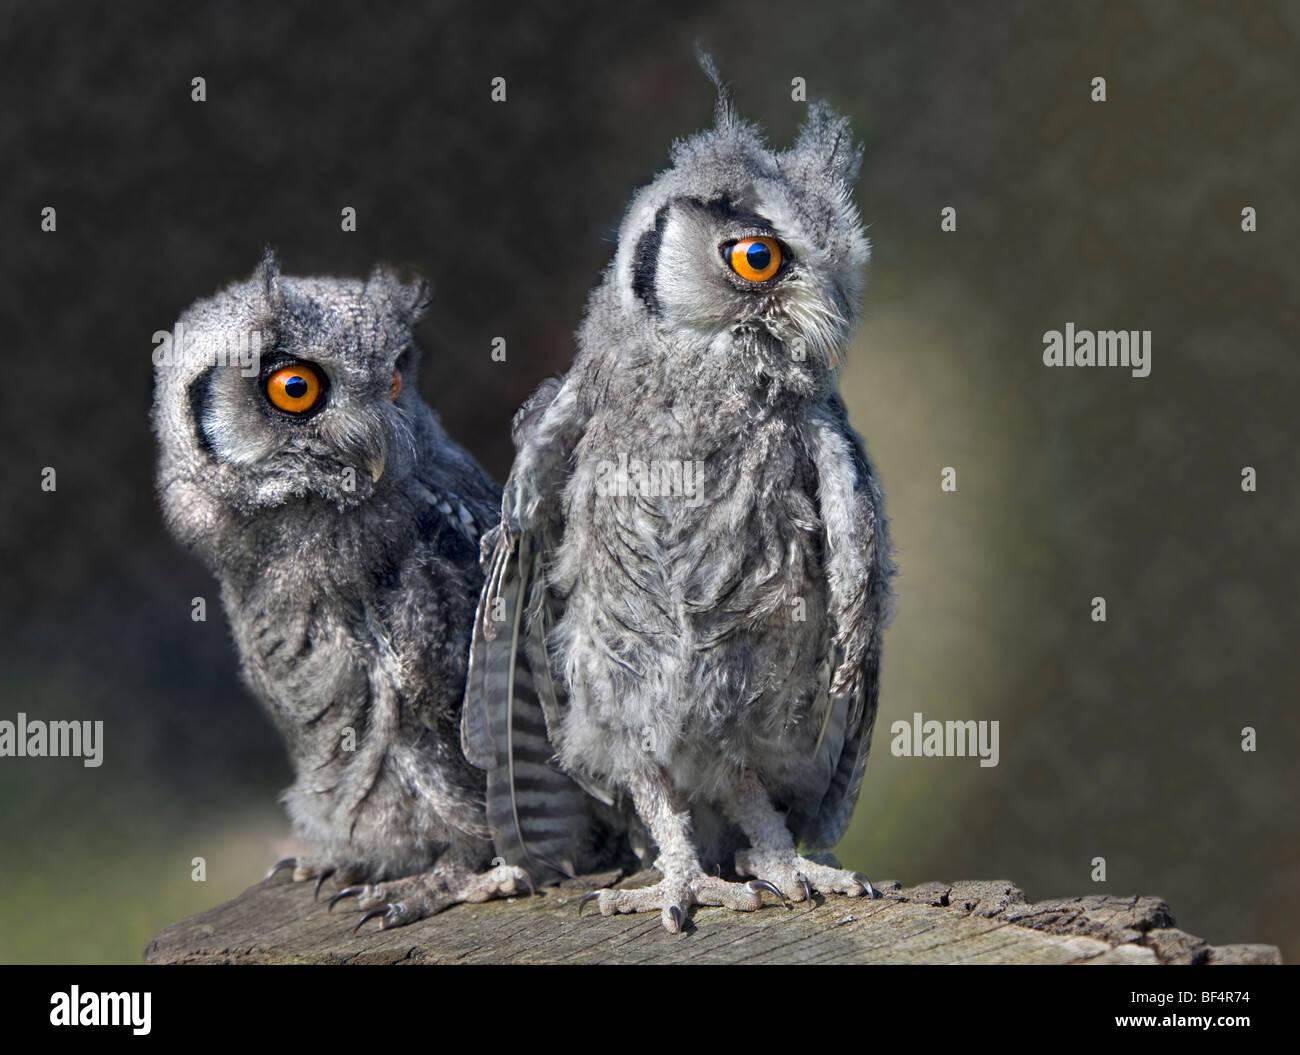 Weißen konfrontiert Zwergohreule Eule Jungvögel (Ptilopsis Leucotis) Stockfoto